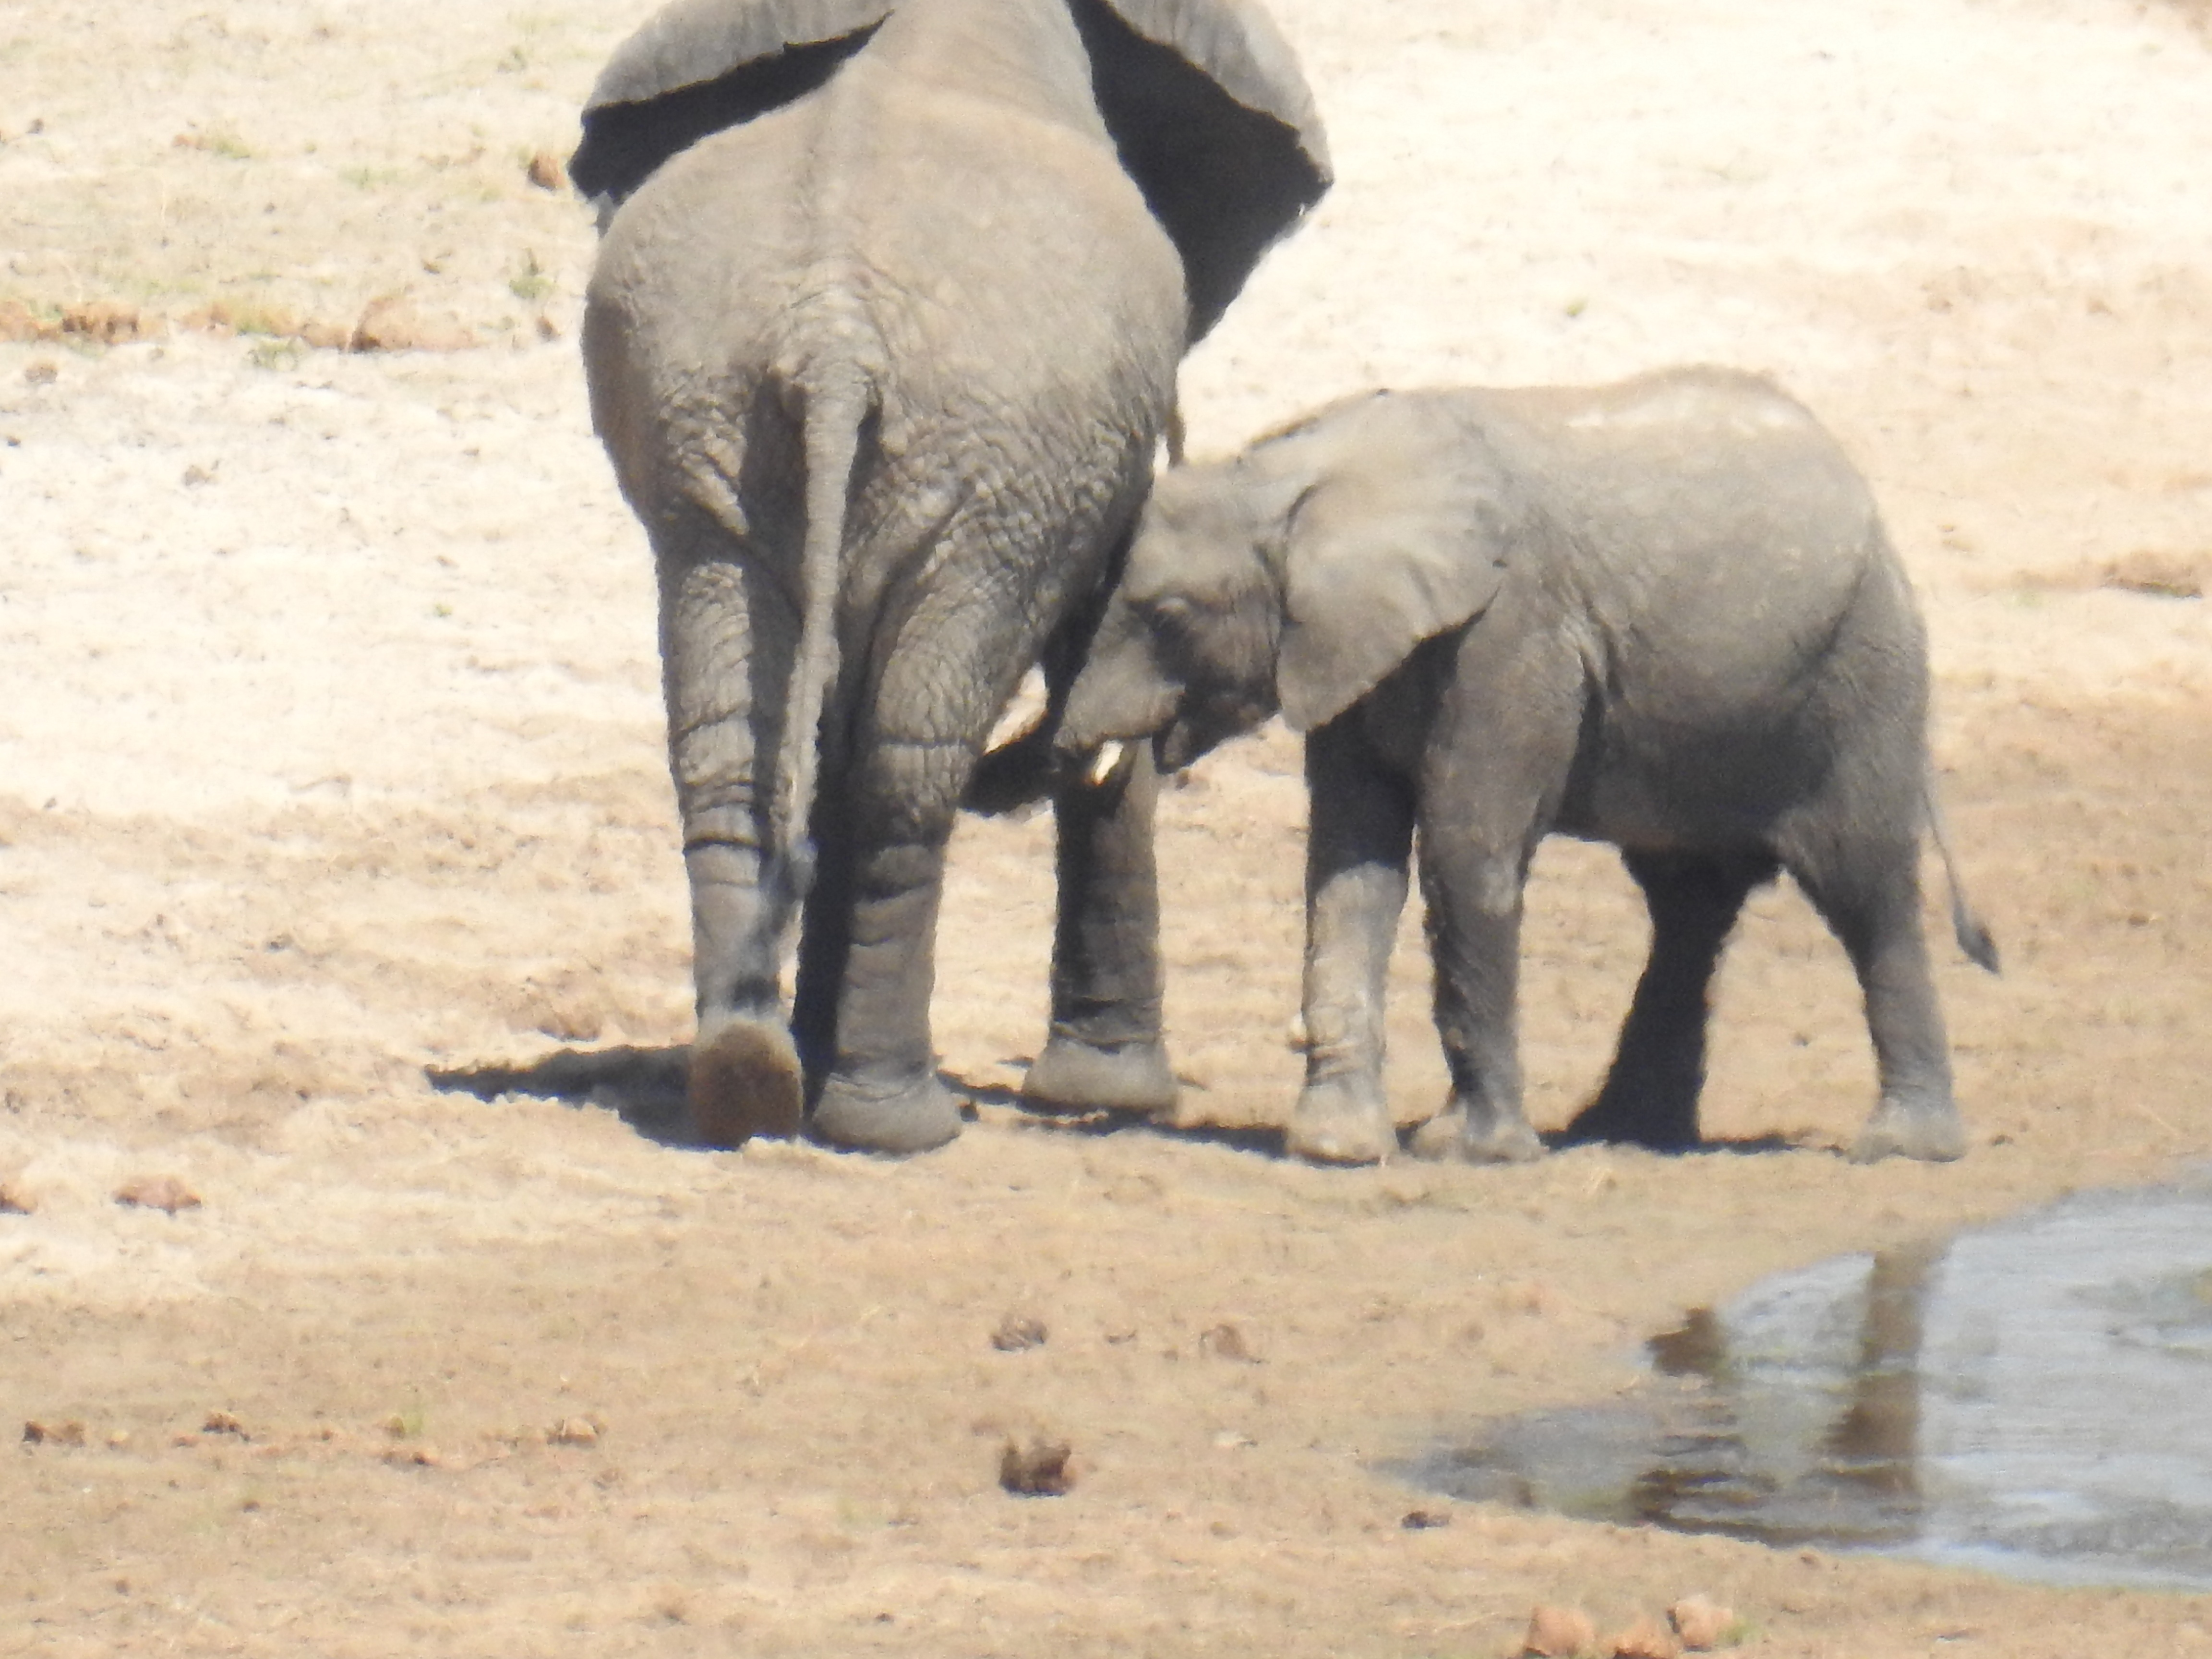 Elephant_nursing.jpg